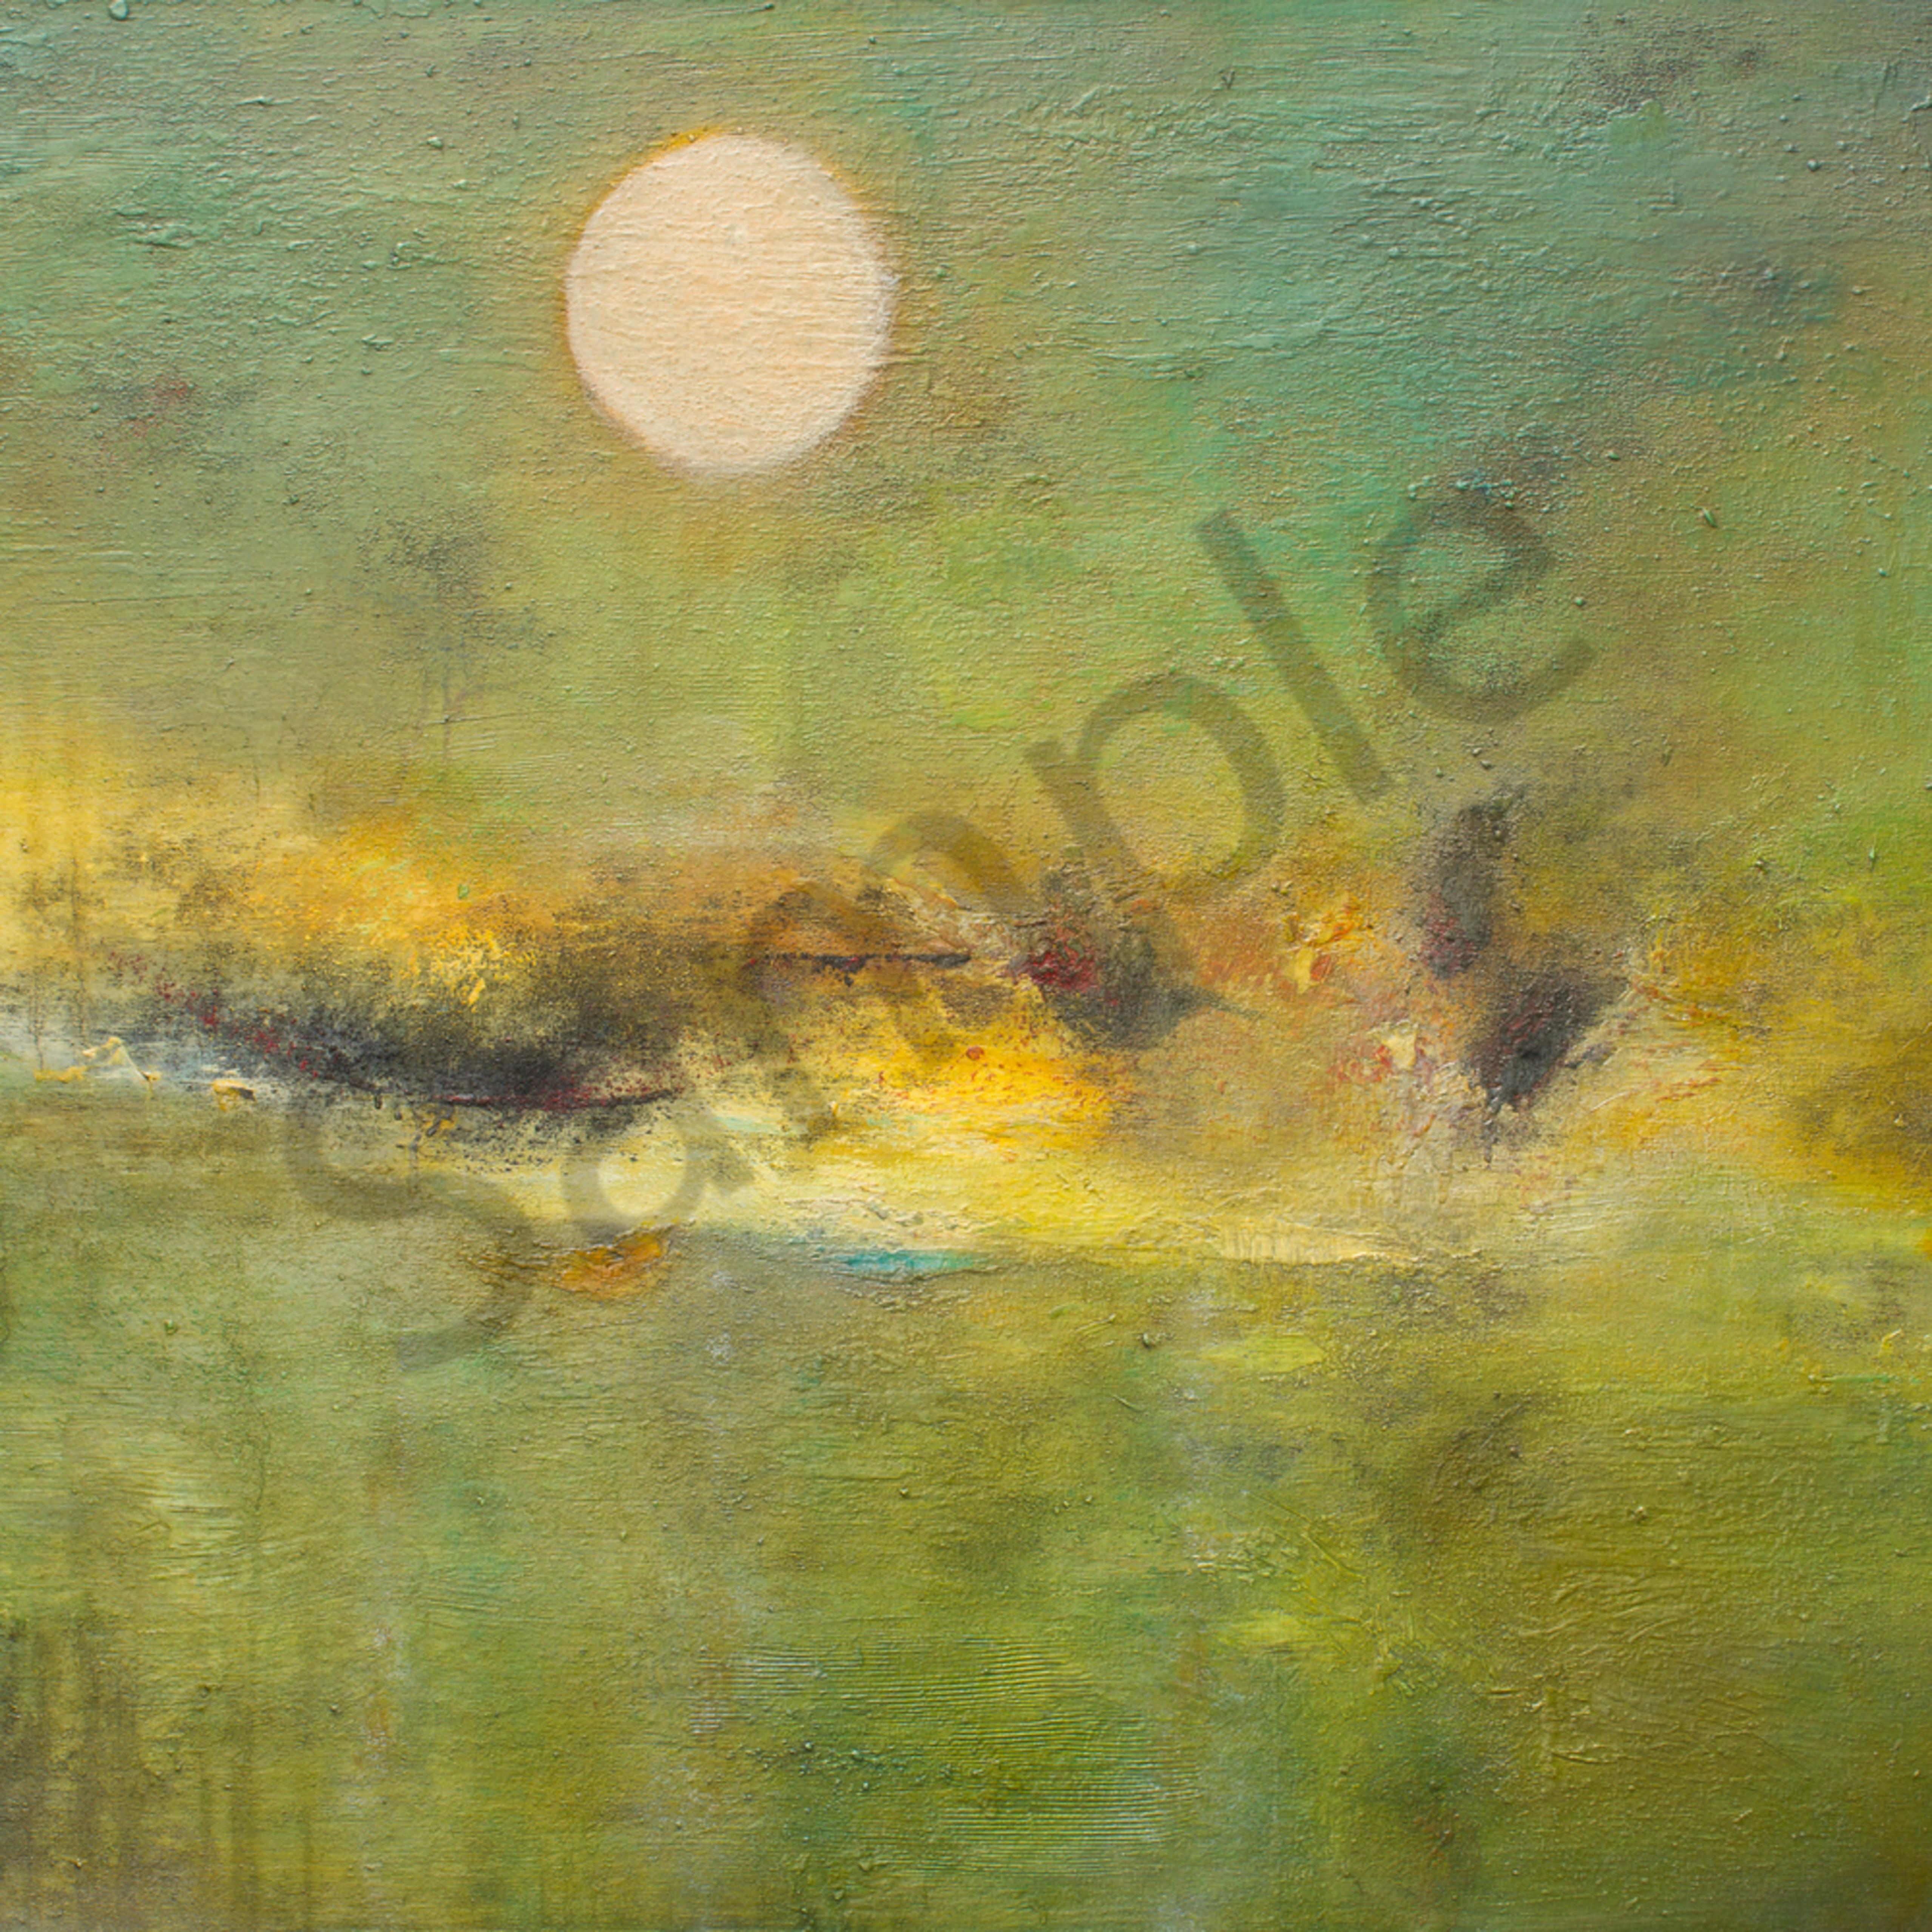 Albion moonlight 40x50 tygeyw